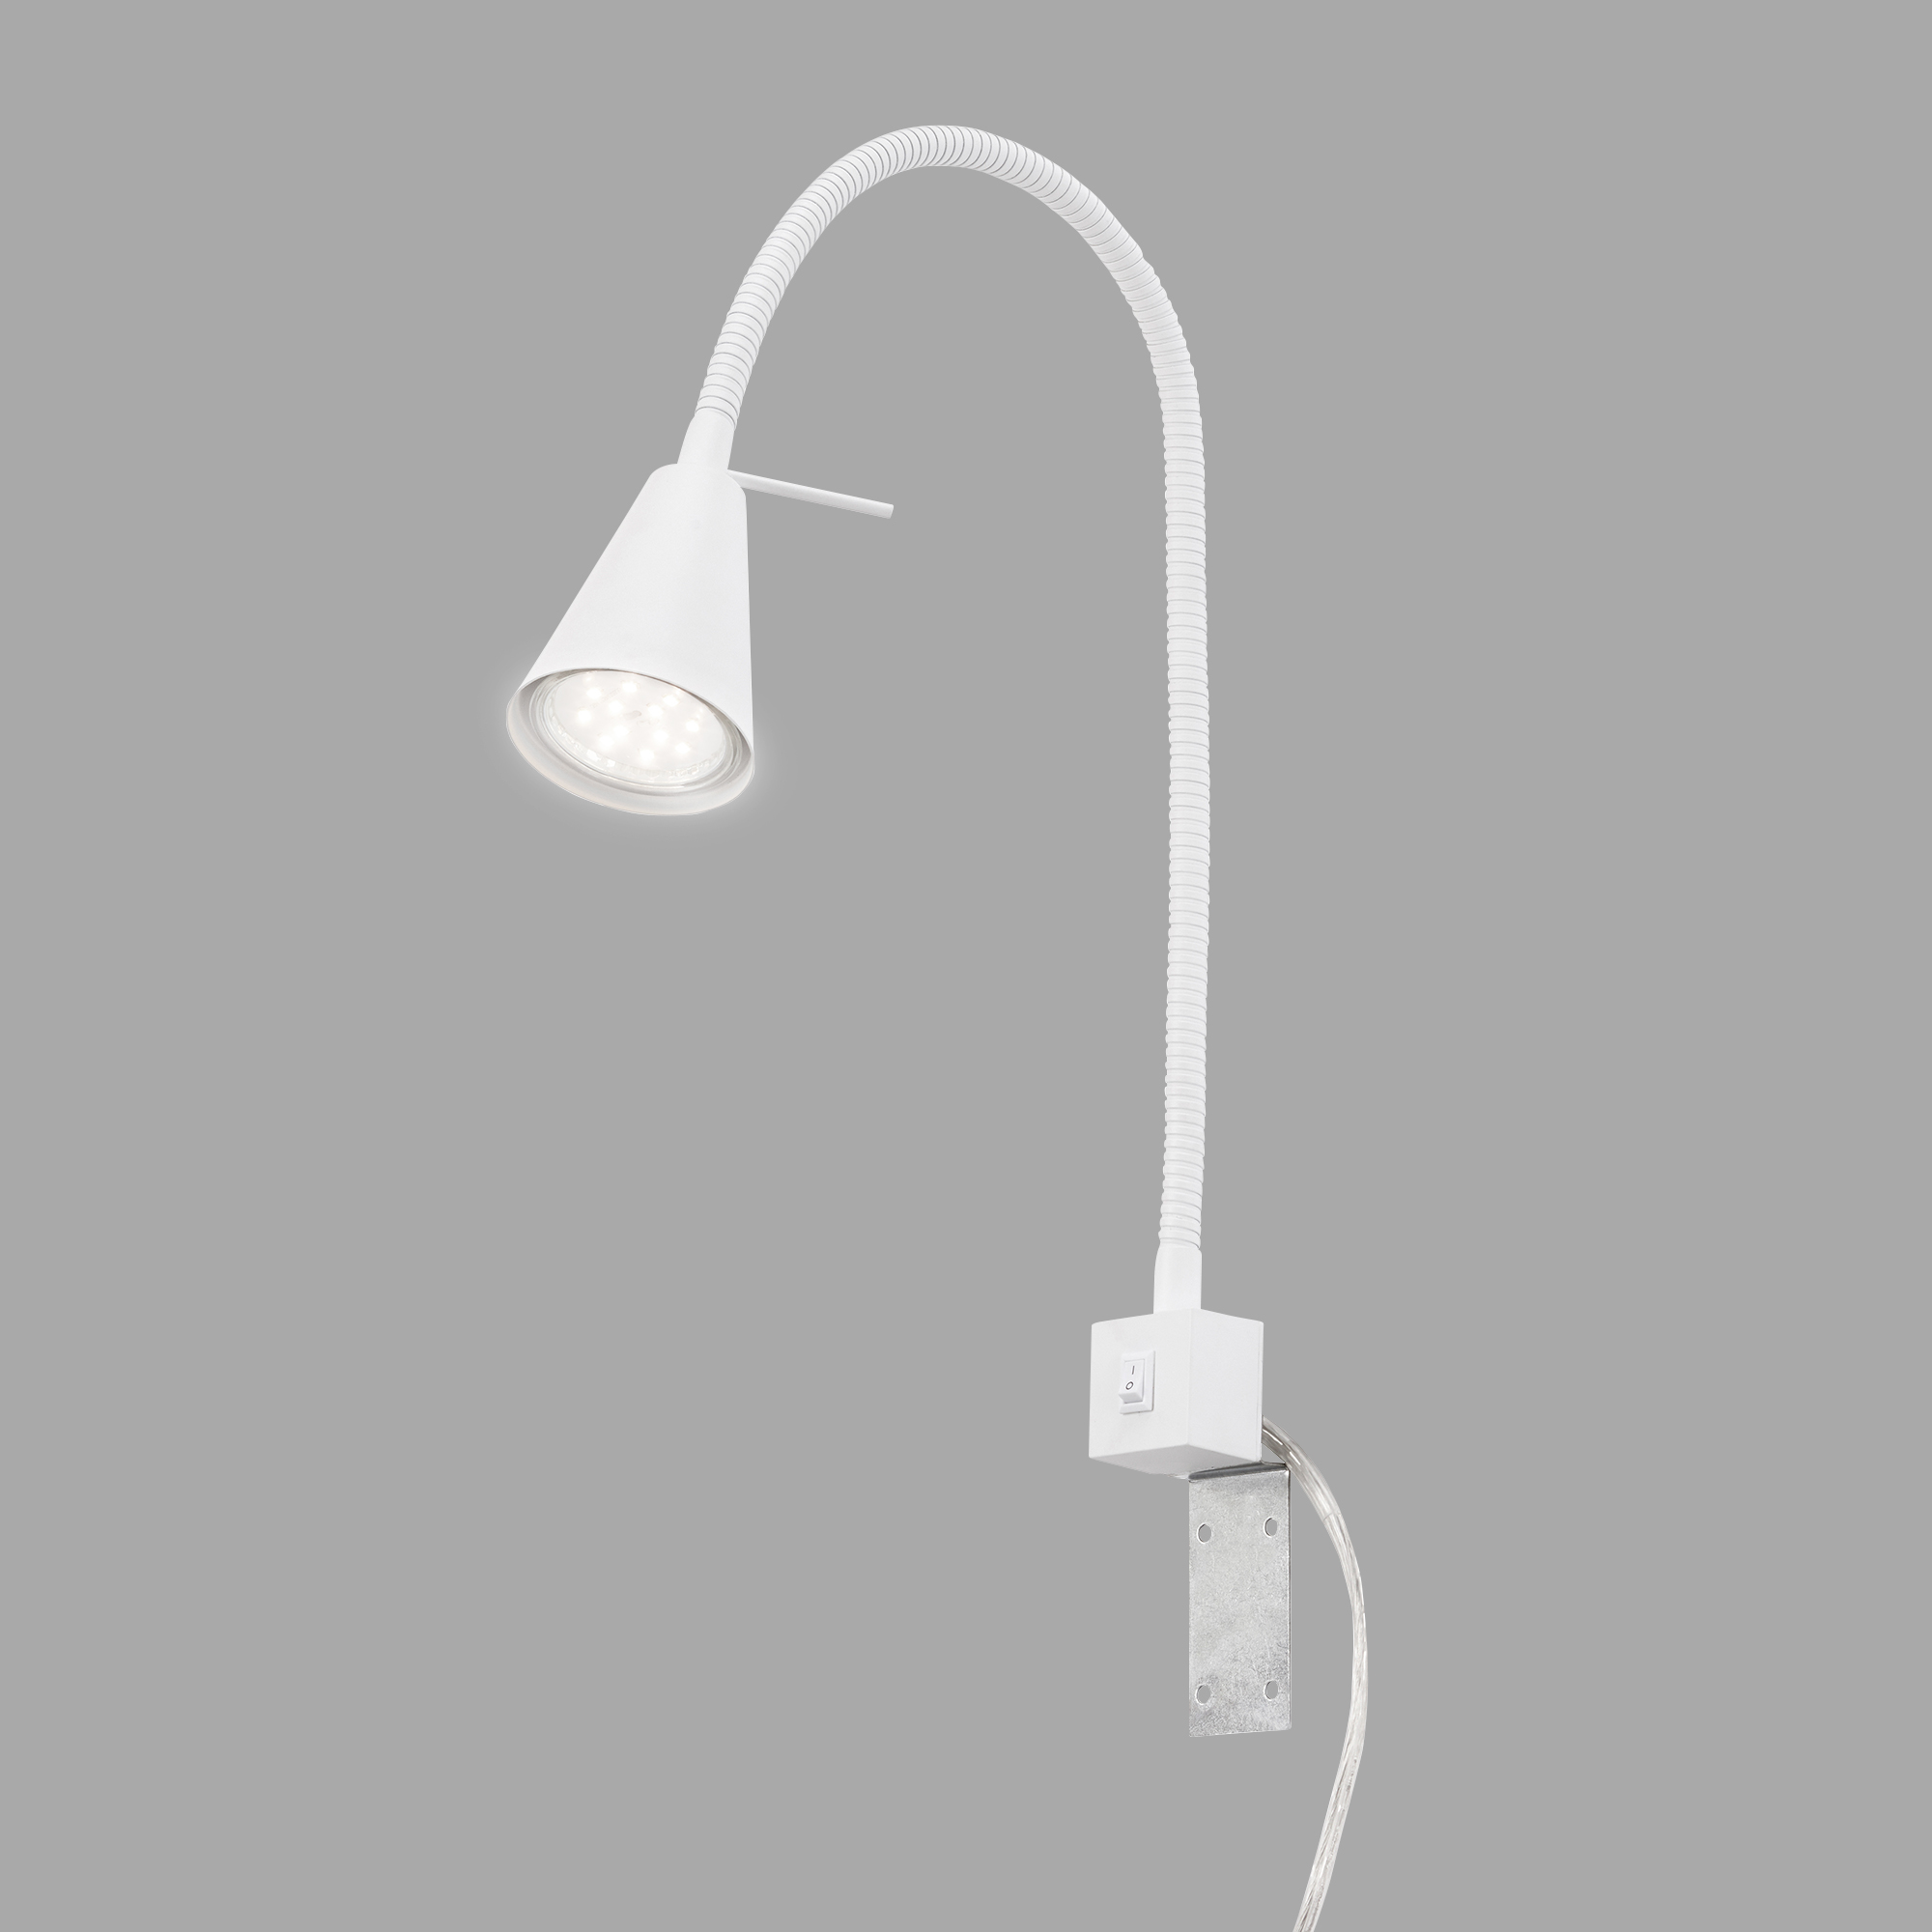 LED Wandleuchte, 40,3 cm, 5 W, Weiss